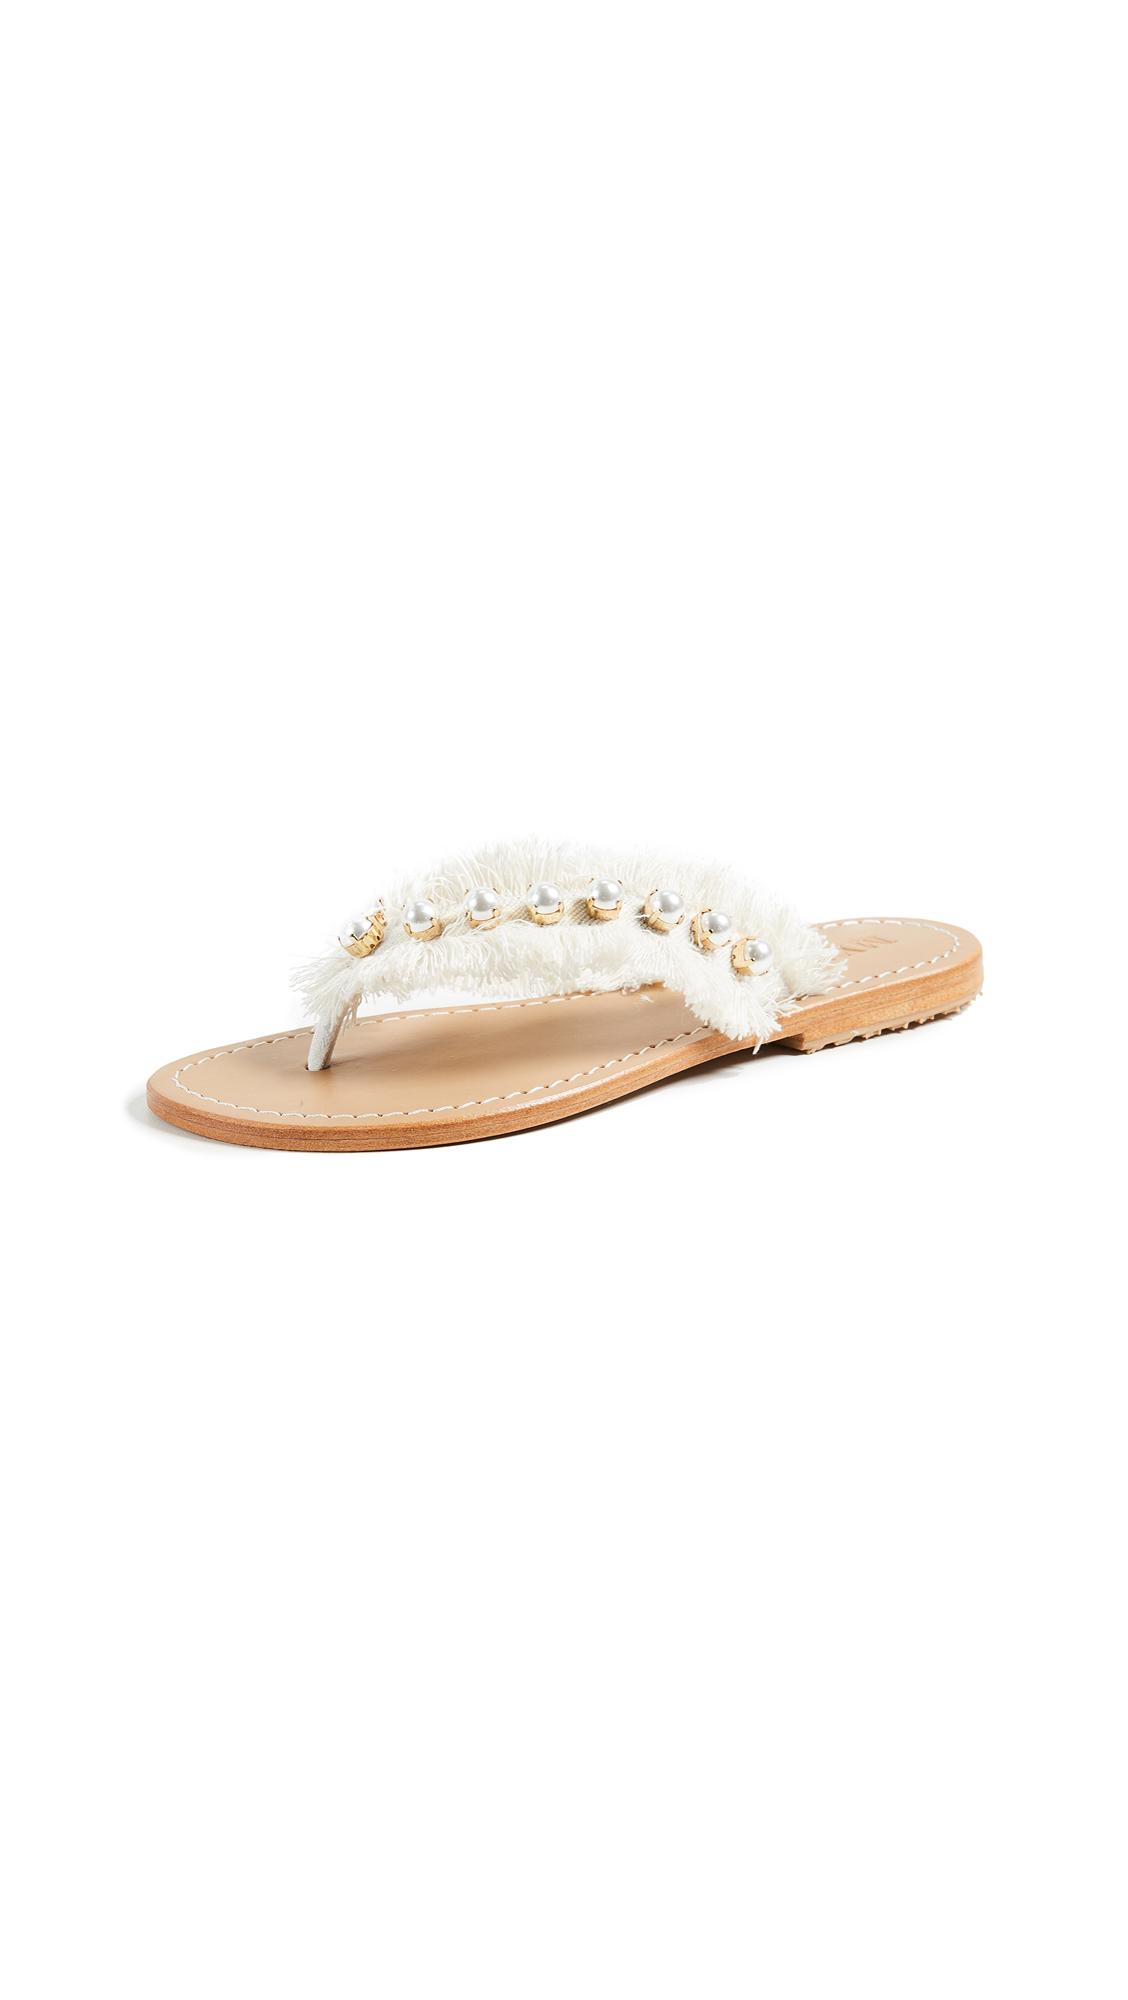 Mystique Imitation Pearl Flip Flops - White